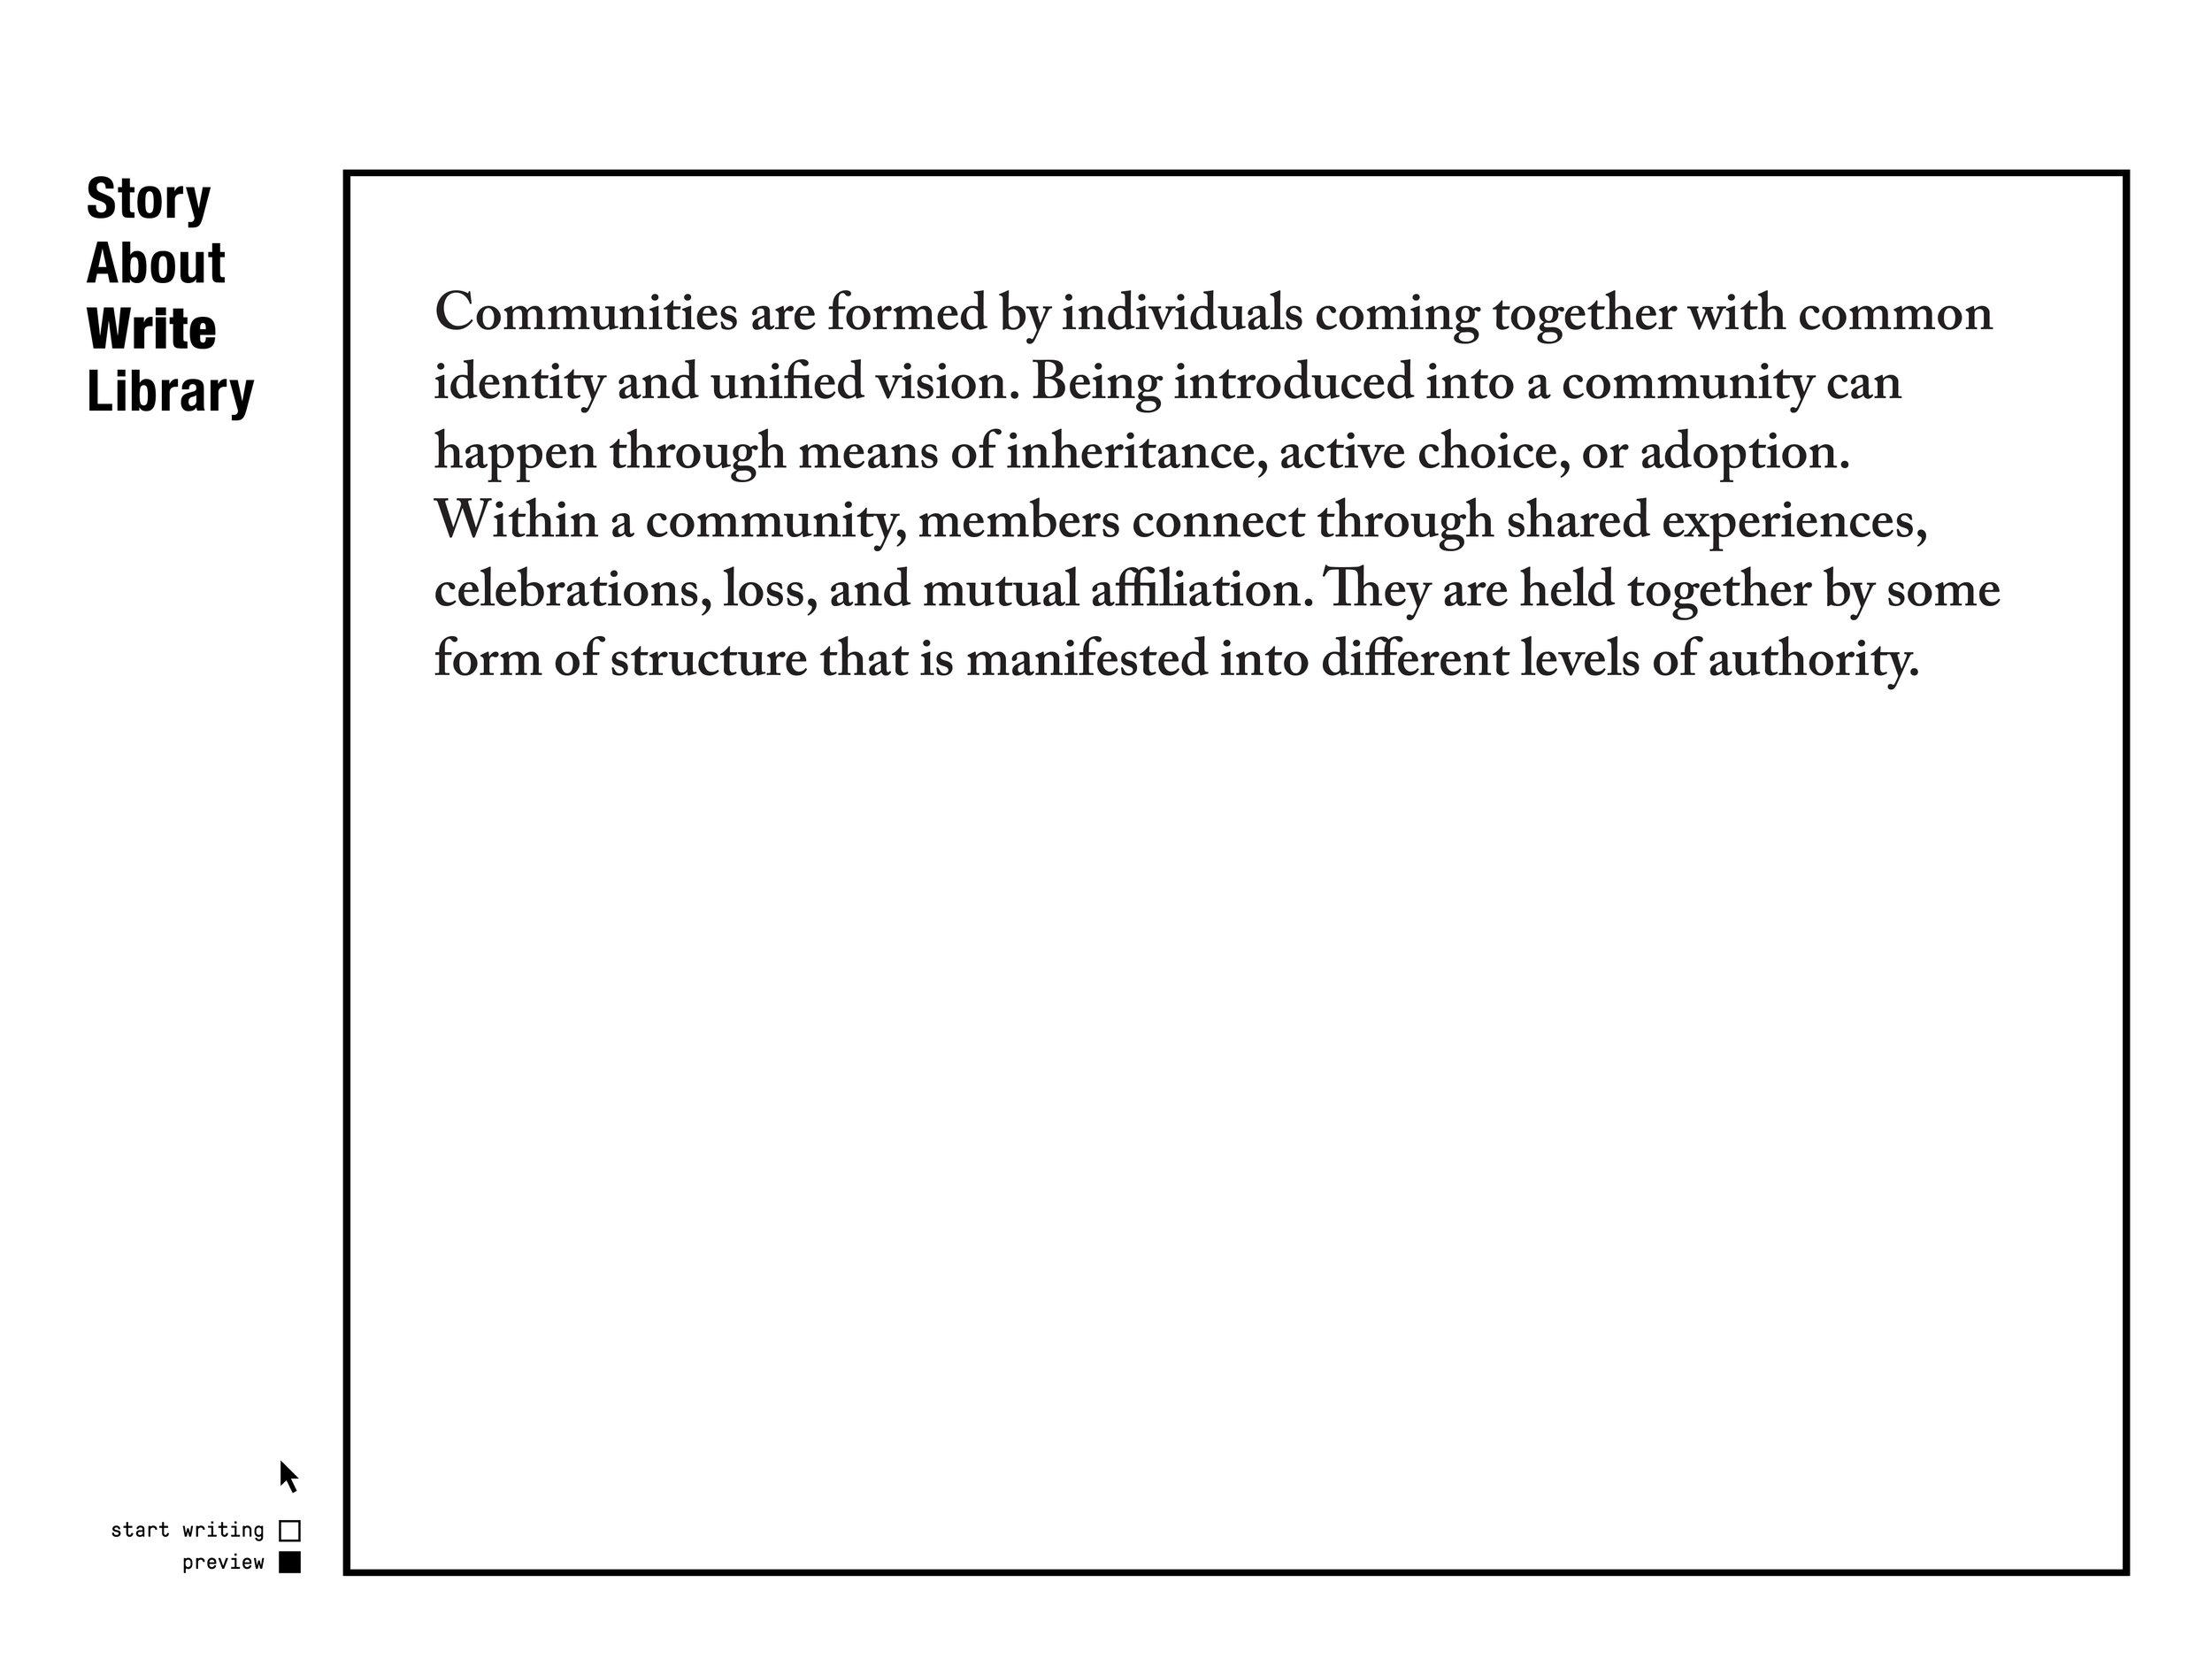 FinalScreens_CommunityStructure-15.jpg